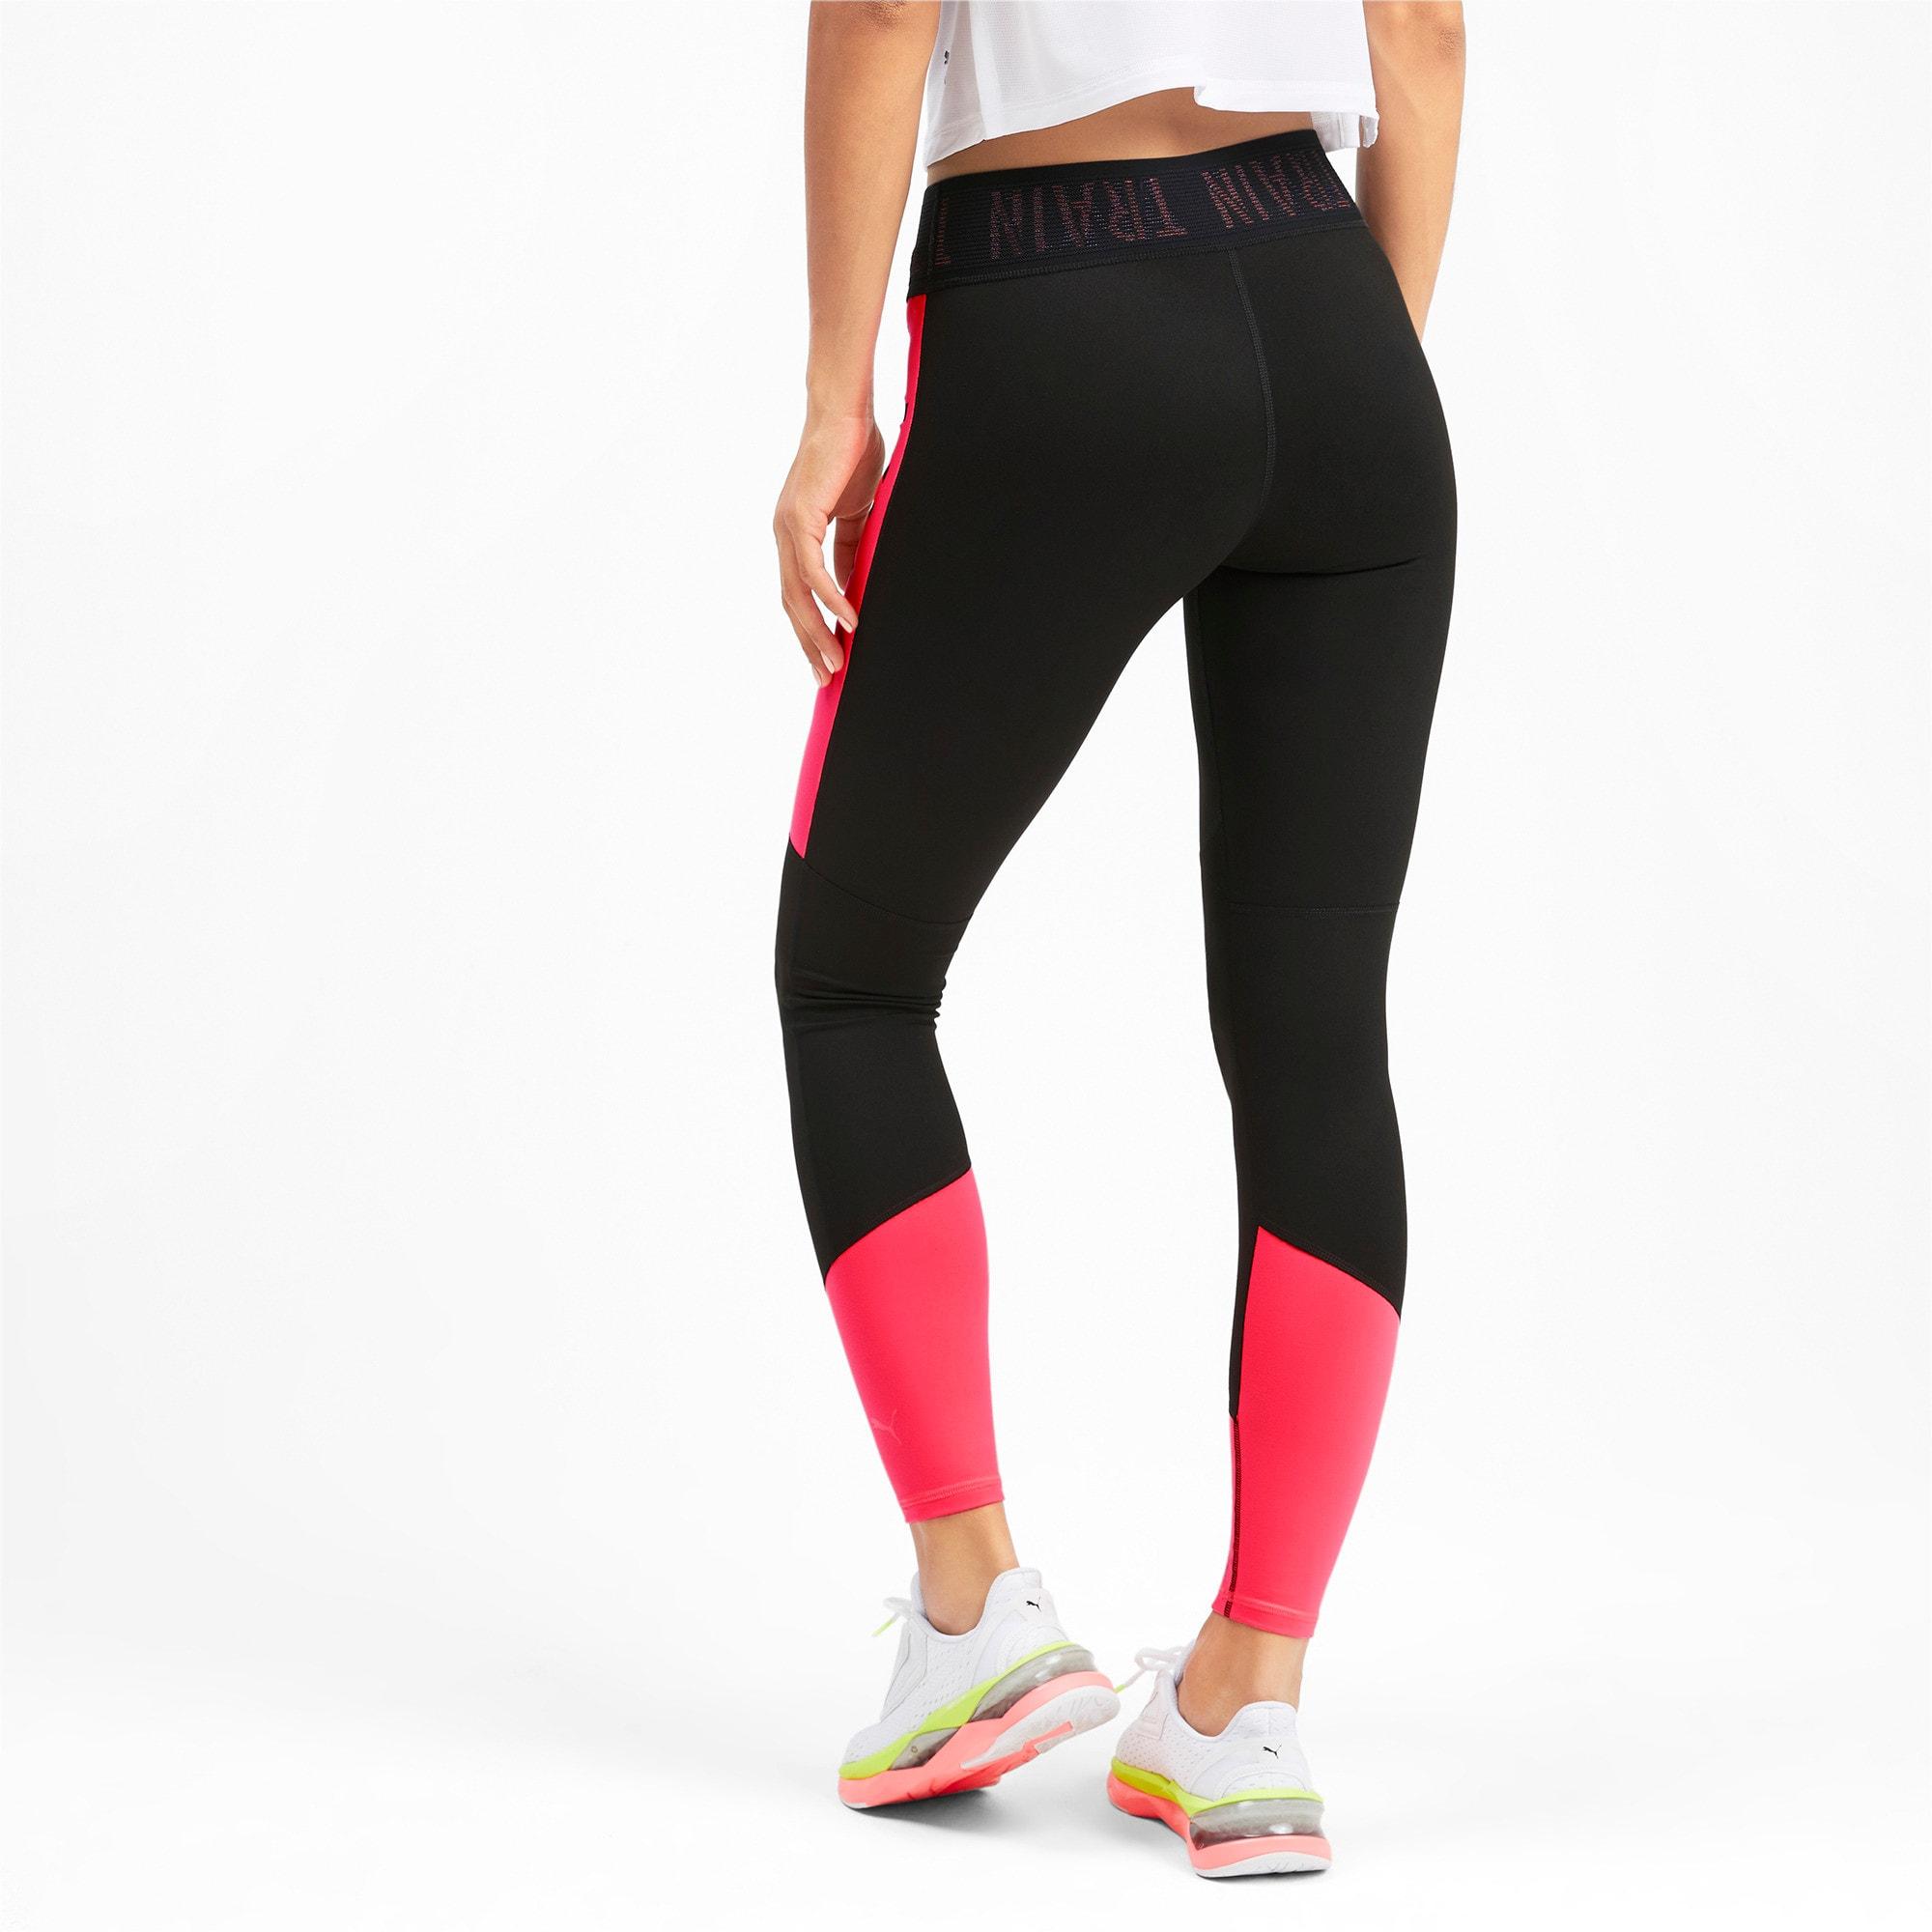 Thumbnail 2 of ADHM 2019 Logo 7/8 Women's Training Leggings, Puma Black-Pink Alert, medium-IND